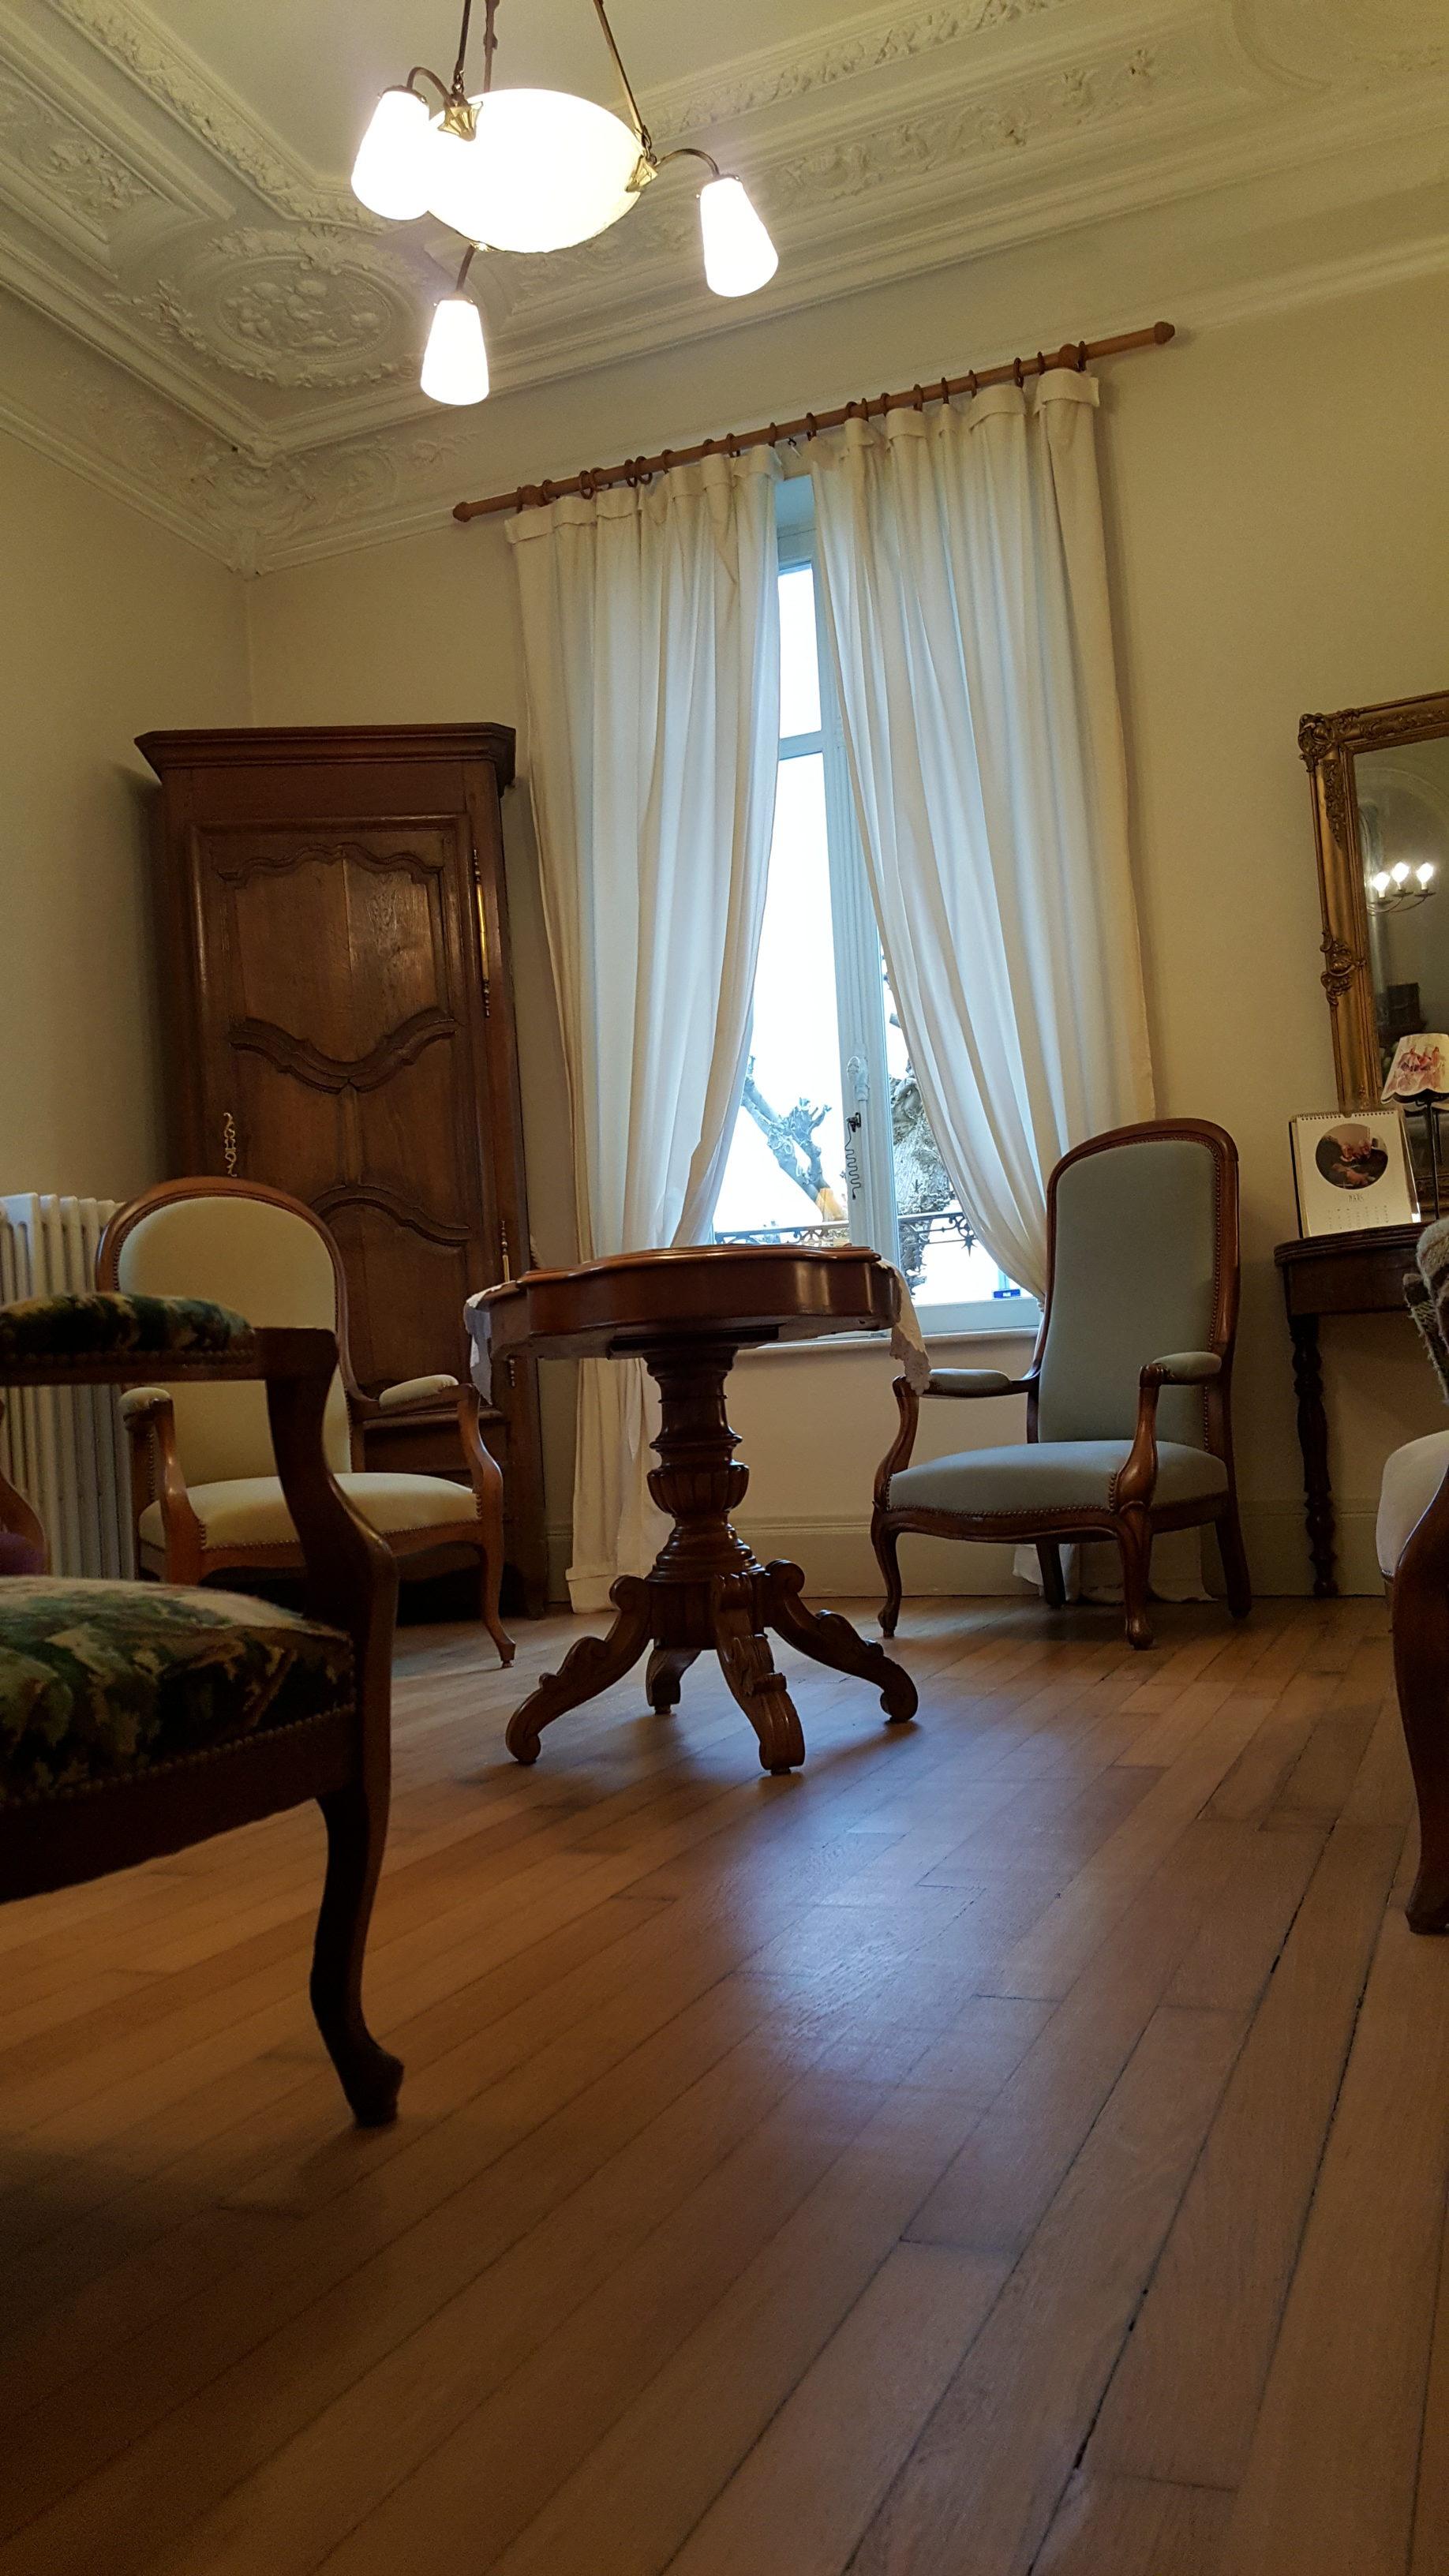 maison bourgeoise saint max salon kara spencer. Black Bedroom Furniture Sets. Home Design Ideas